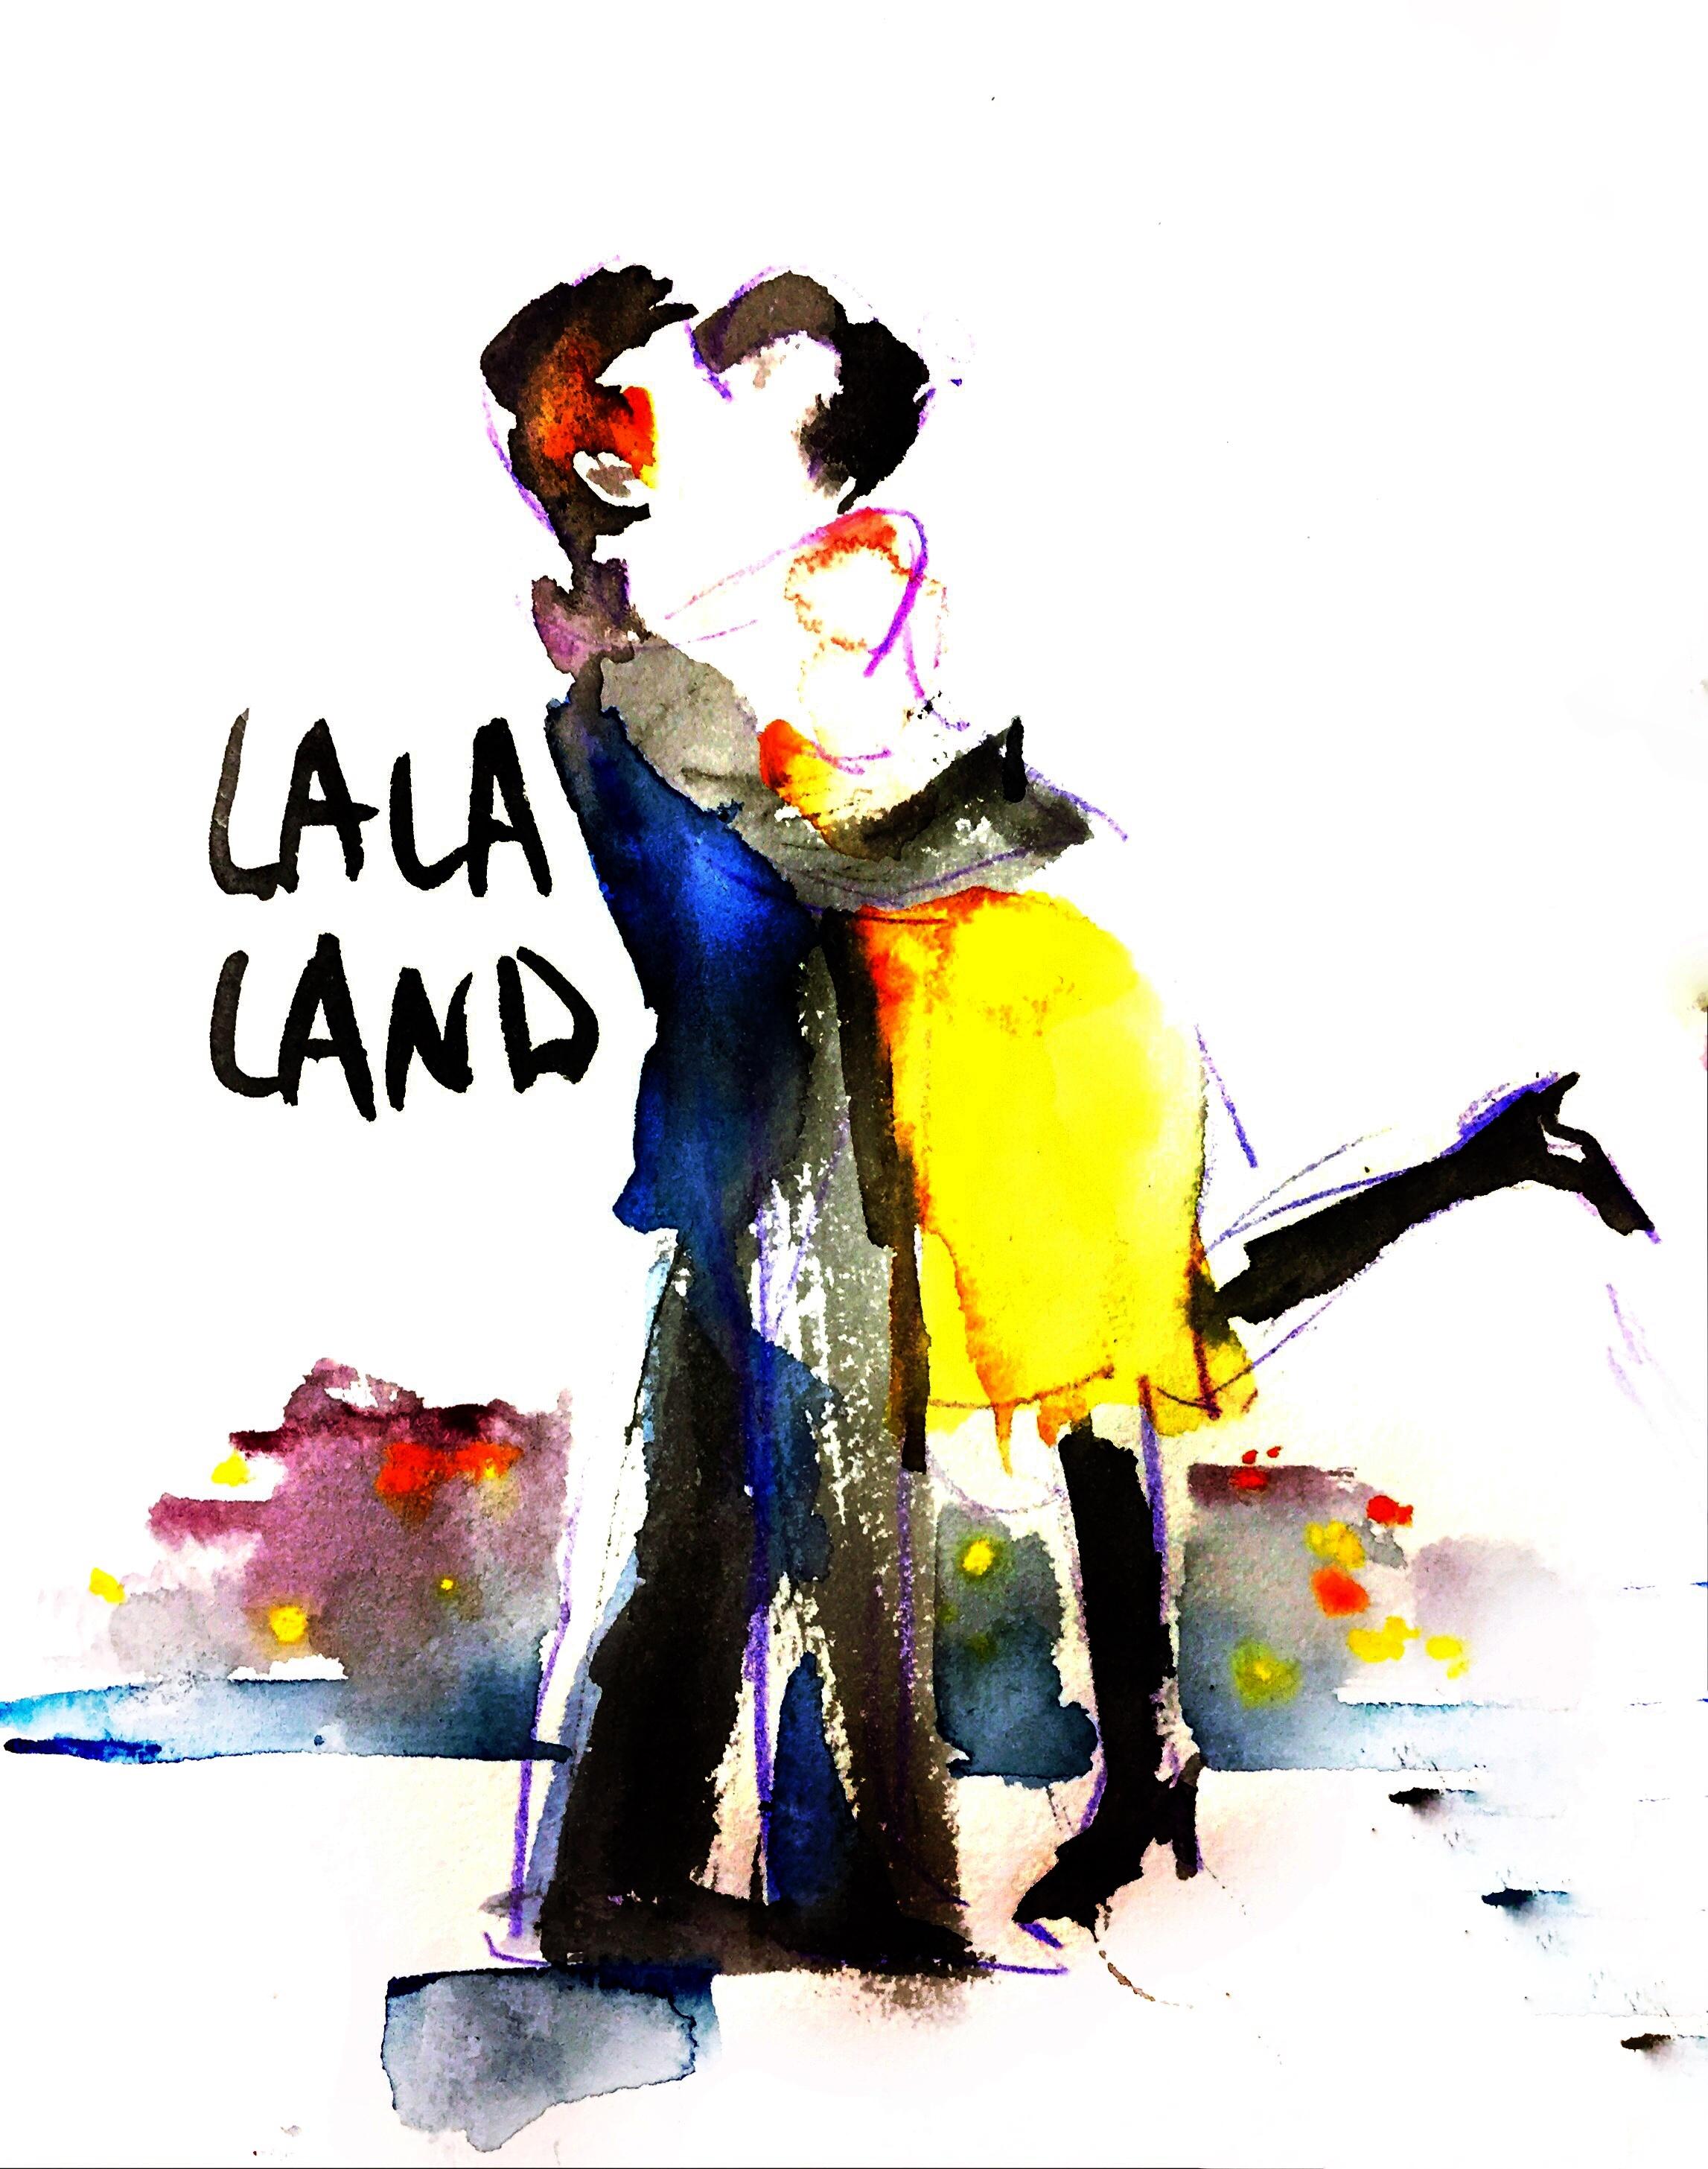 lala land 四重奏谱子